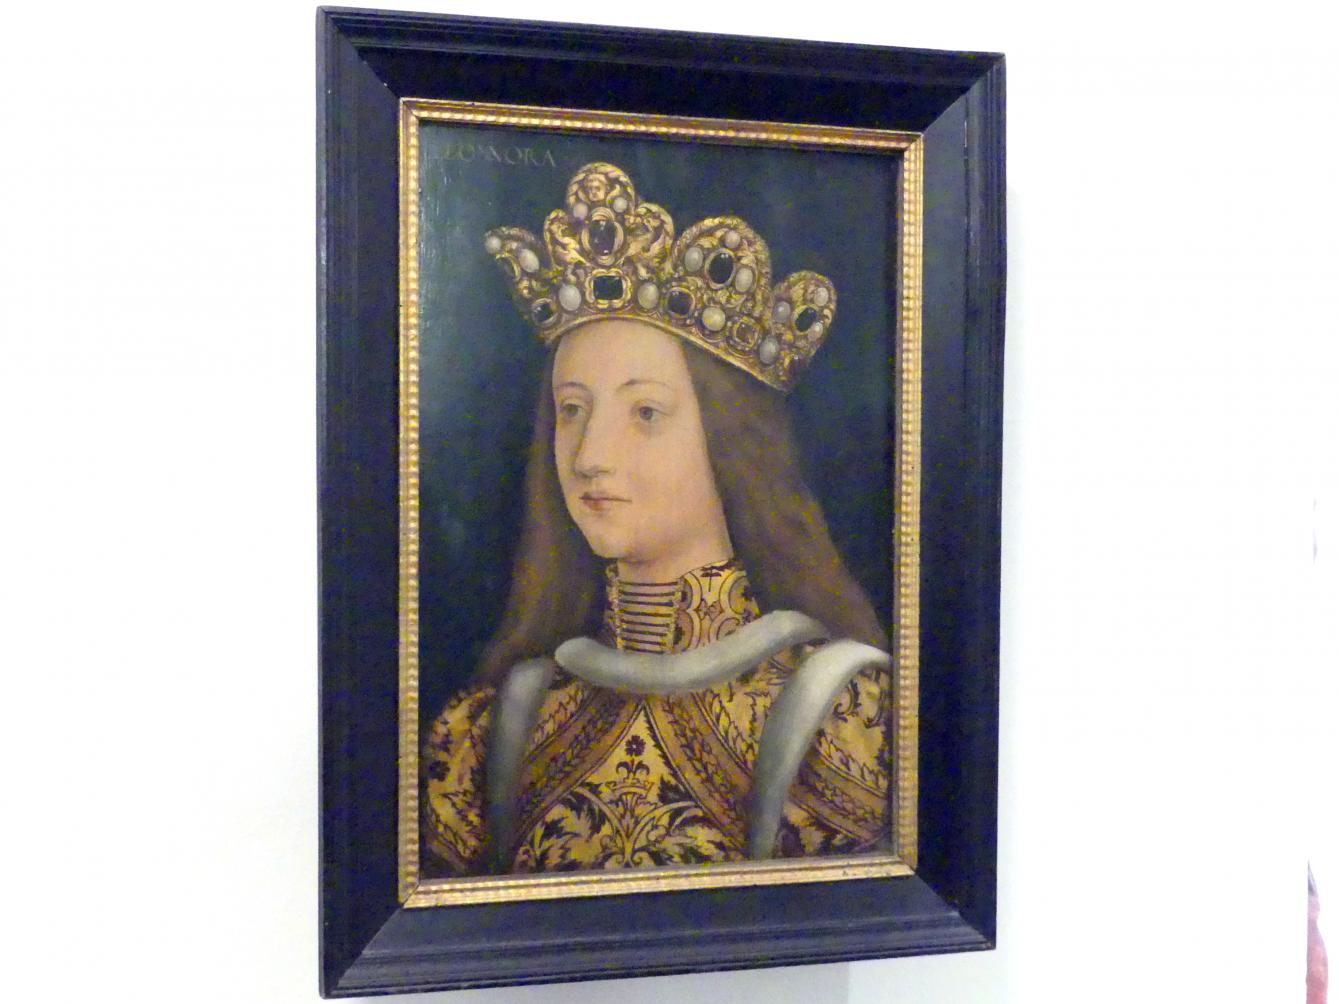 Hans Burgkmair der Ältere: Eleonore von Portugal (1436-1467), Um 1510